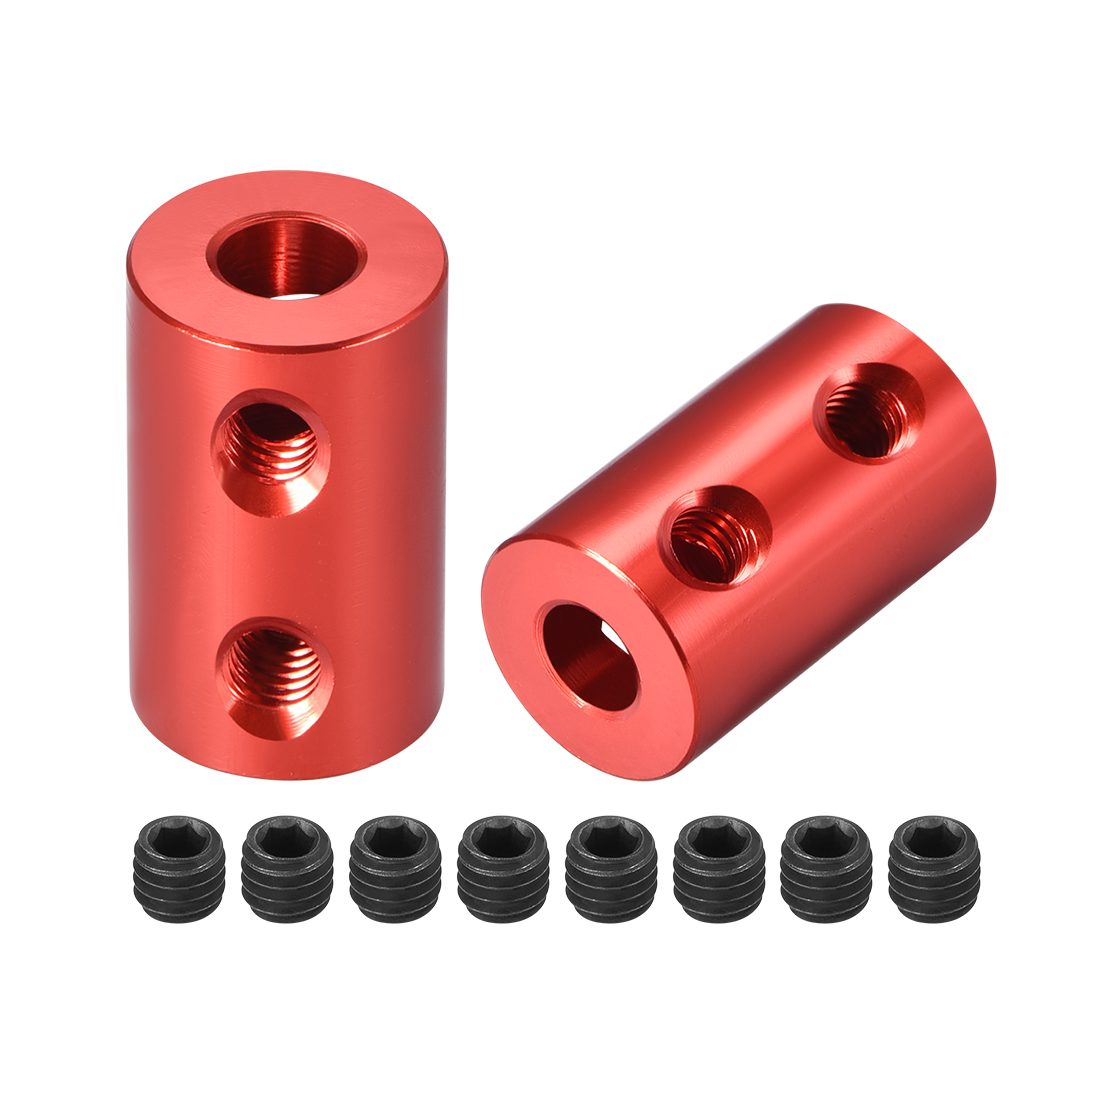 Shaft Coupling 5mm to 5mm Bore L20xD12 Robot Motor Wheel Rigid Coupler Red 2 Pcs